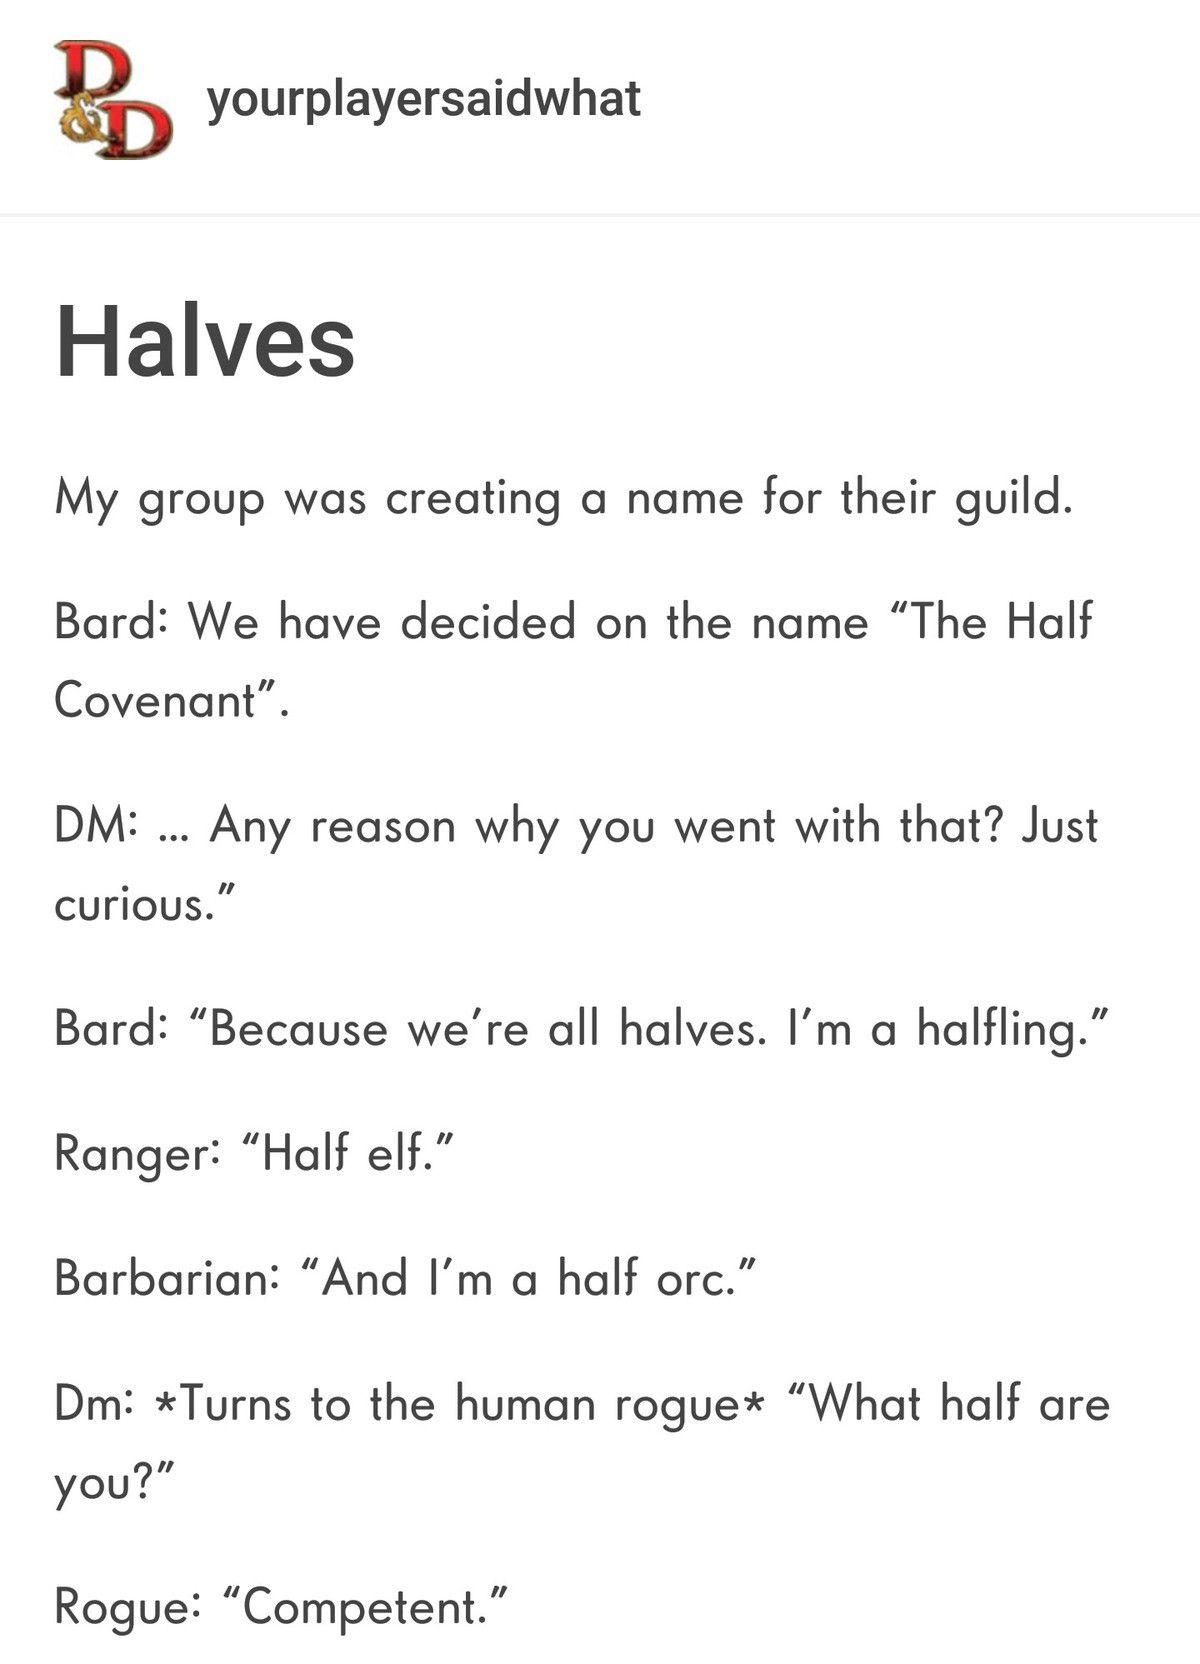 The Halves